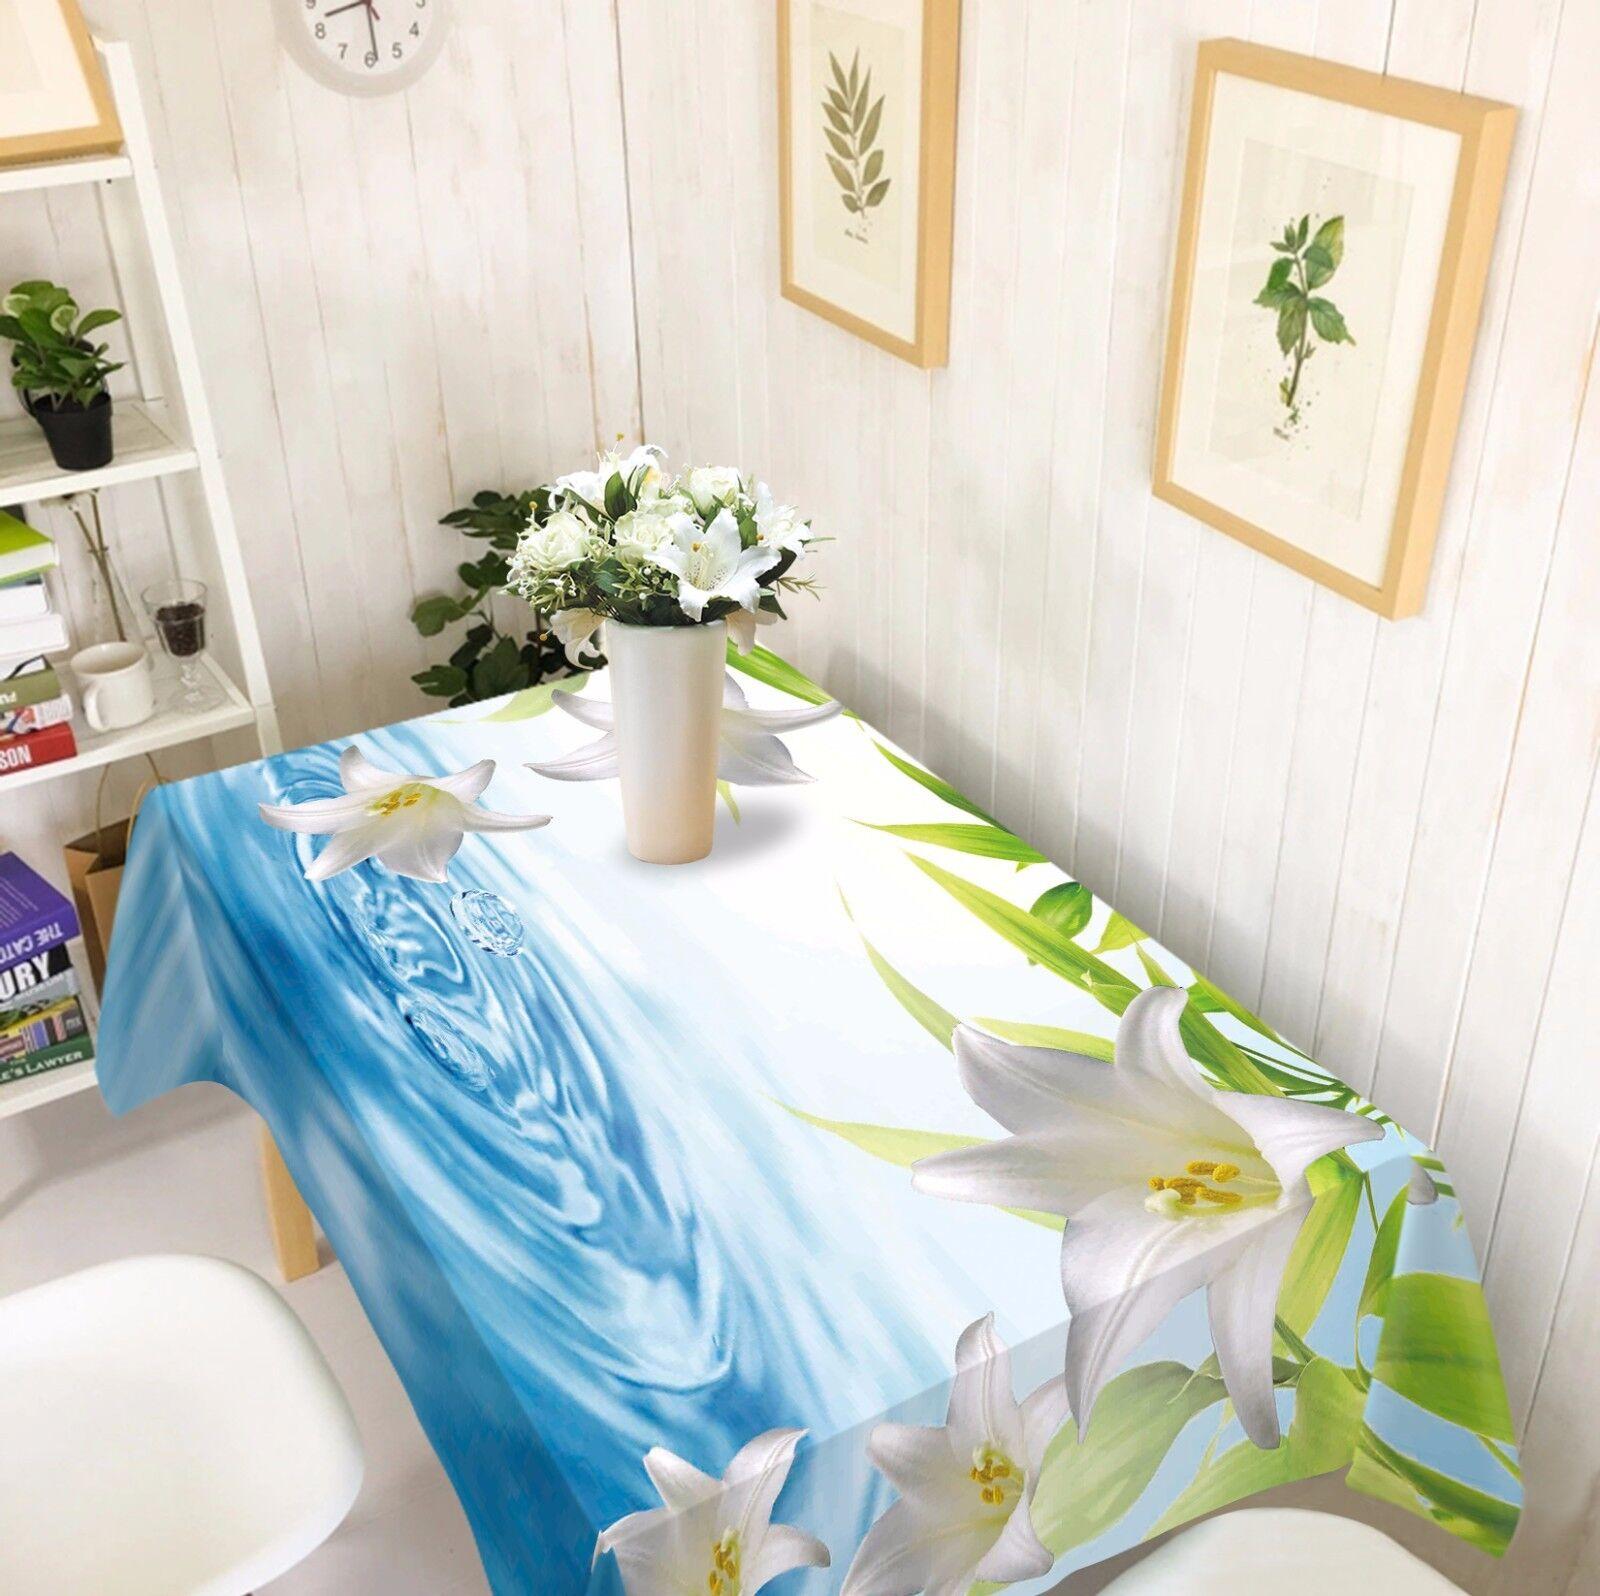 Lirio de 3D blancoo Mantel Mantel Paño Cumpleaños Fiesta AJ Wallpaper Reino Unido Limón